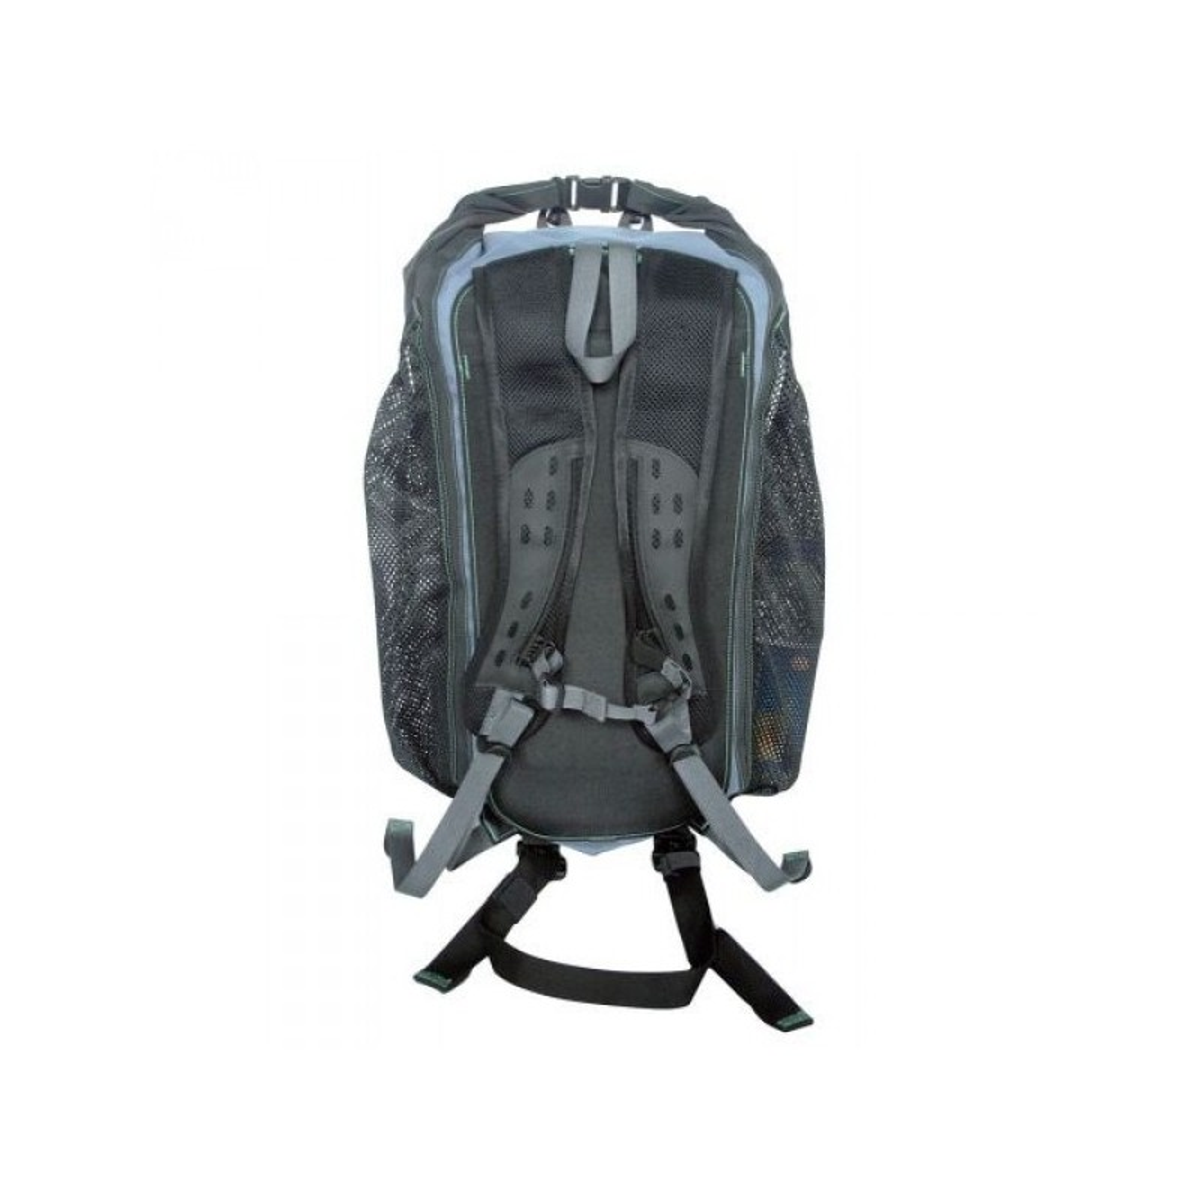 Mugursomas Aquapac Wet and Dry Backpack 25 L